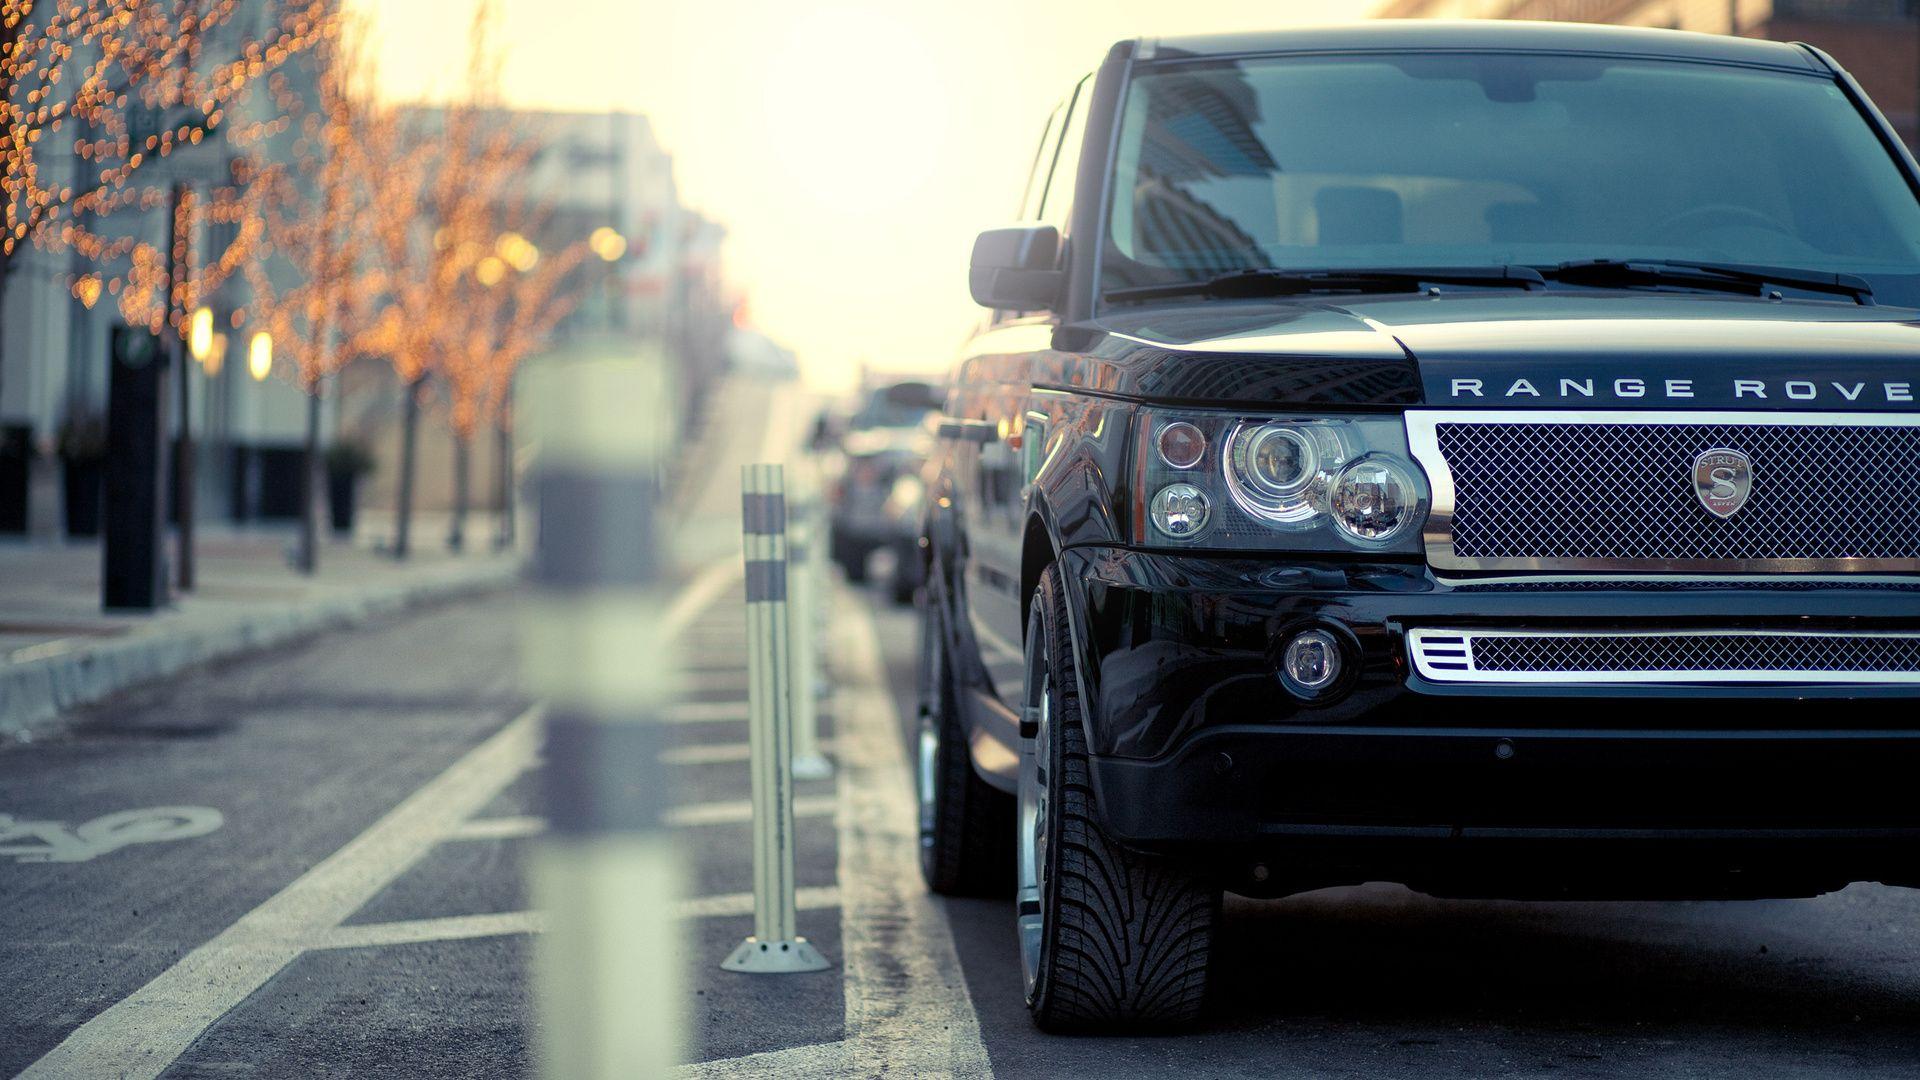 Range Rover car Cars Pinterest